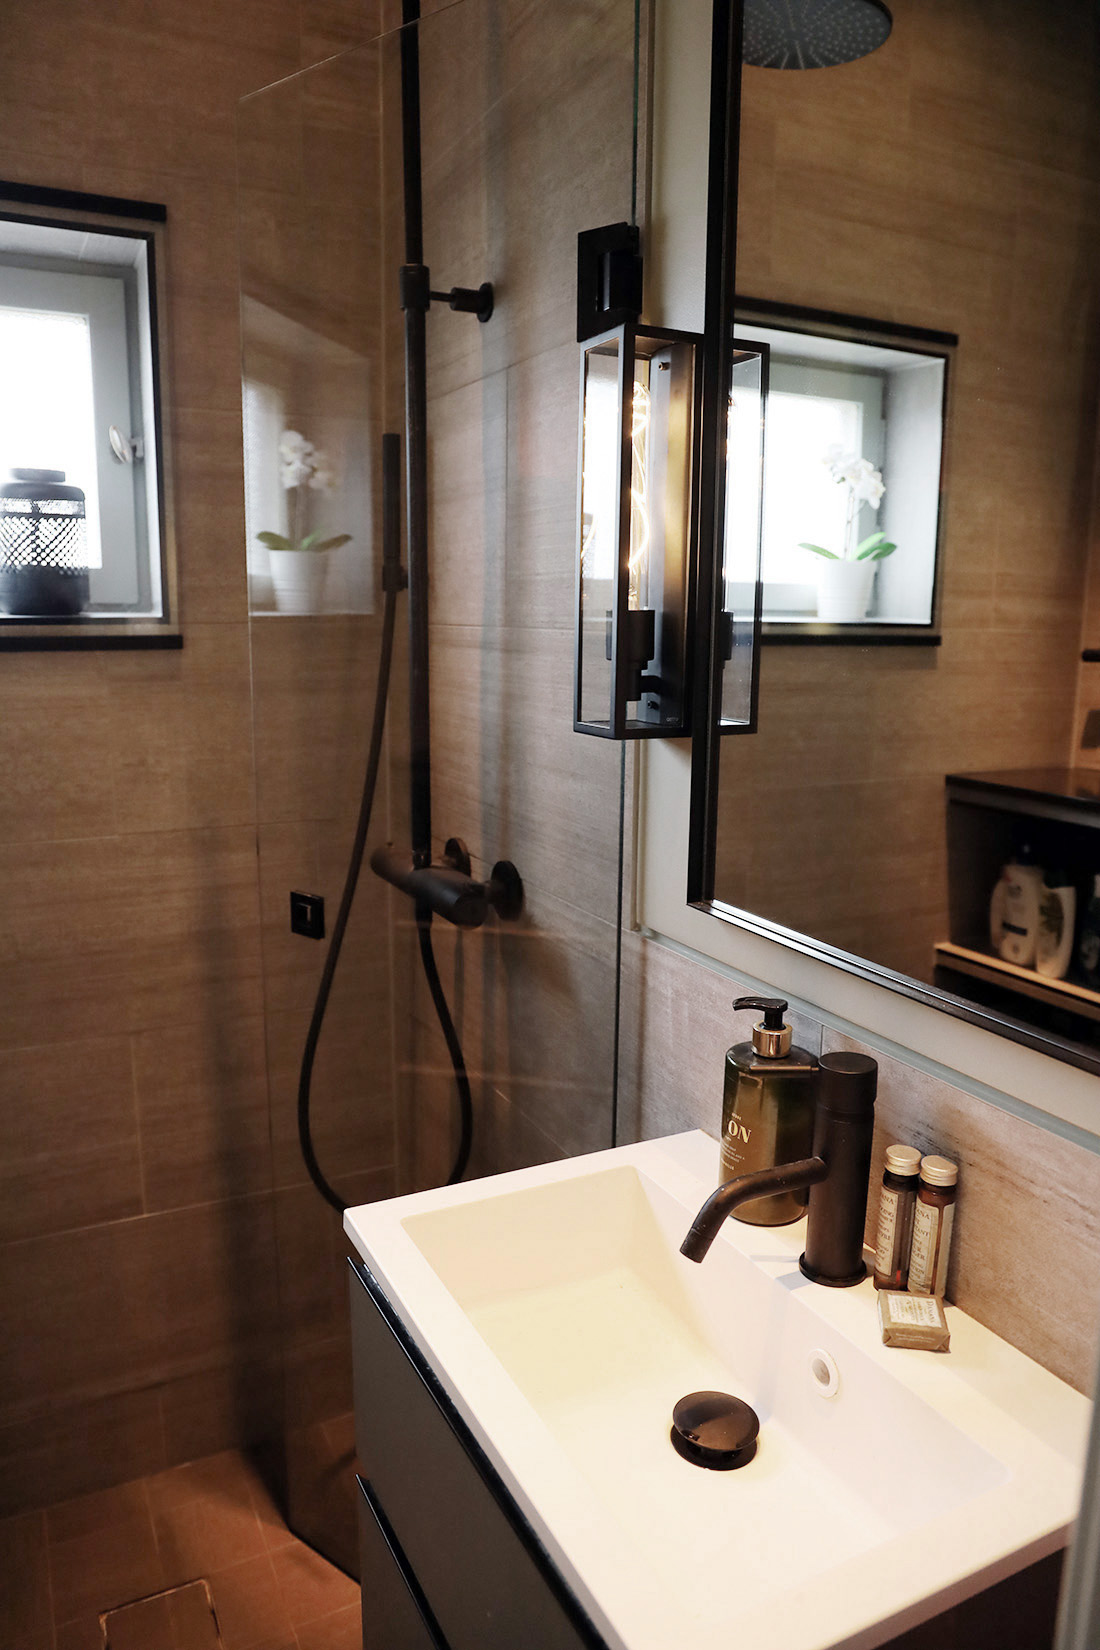 Renoverat badrum med premiumkänsla